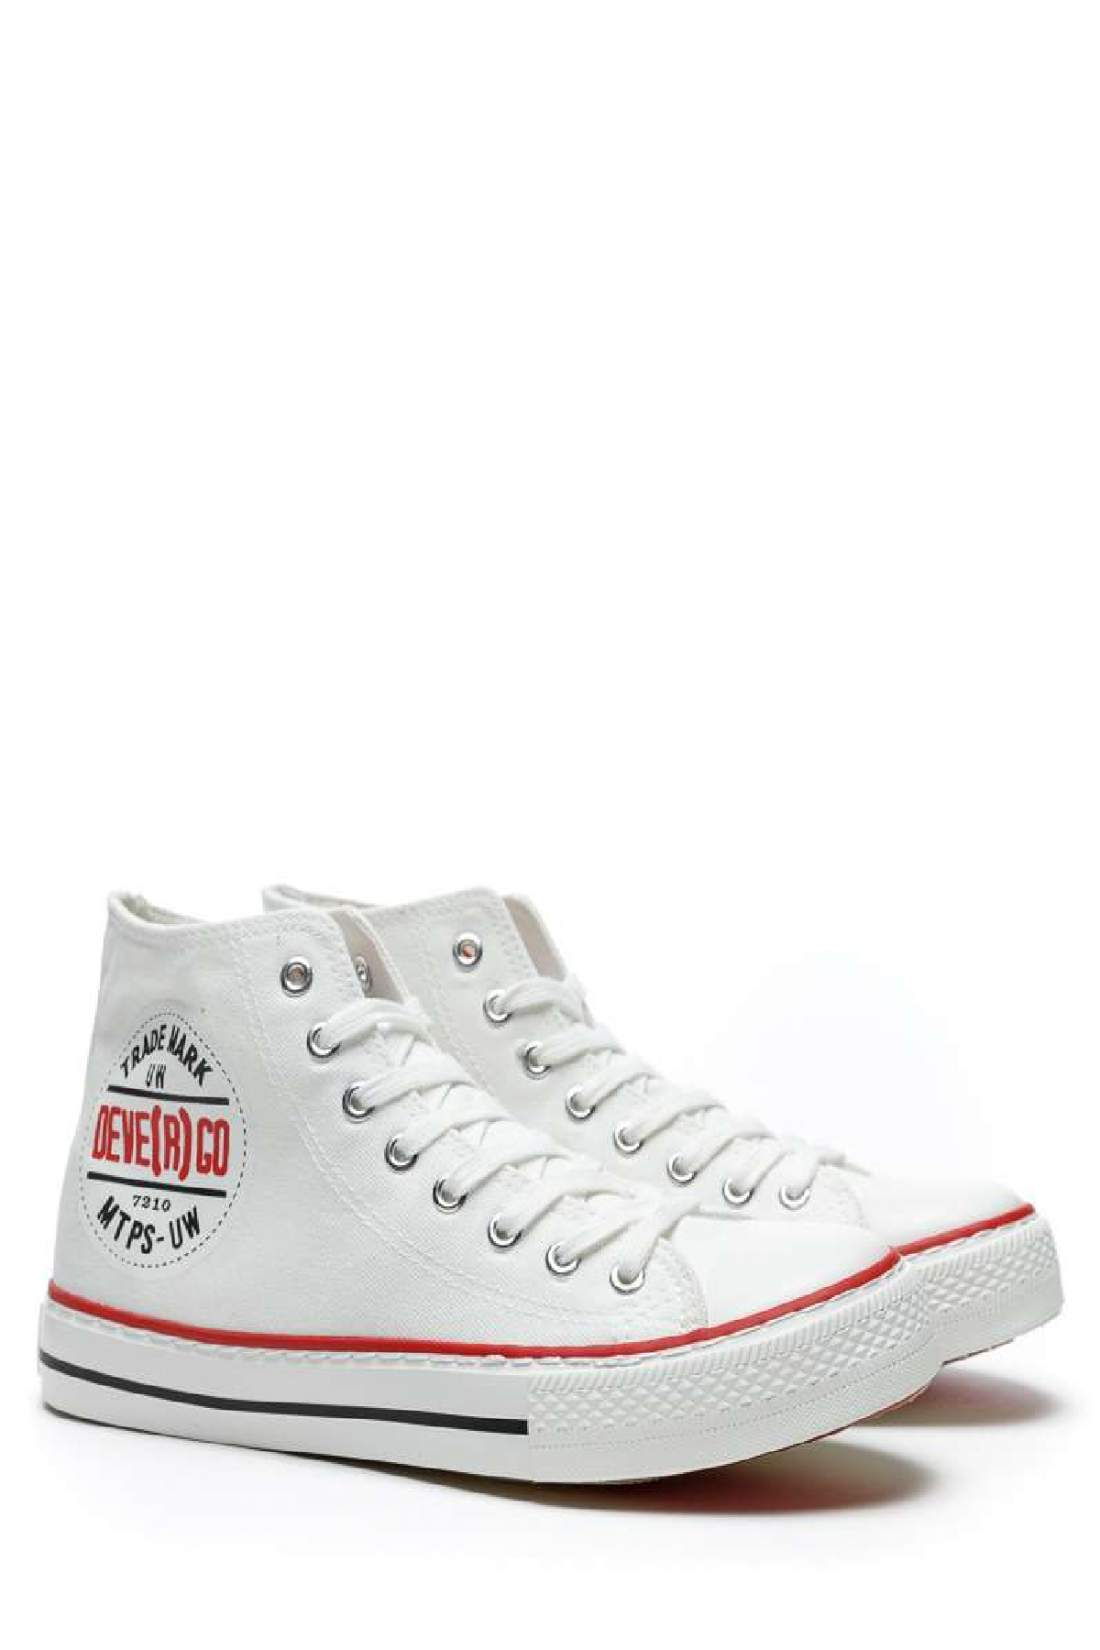 Devergo ALEX férfi magasszárú tornacipő - Fehér